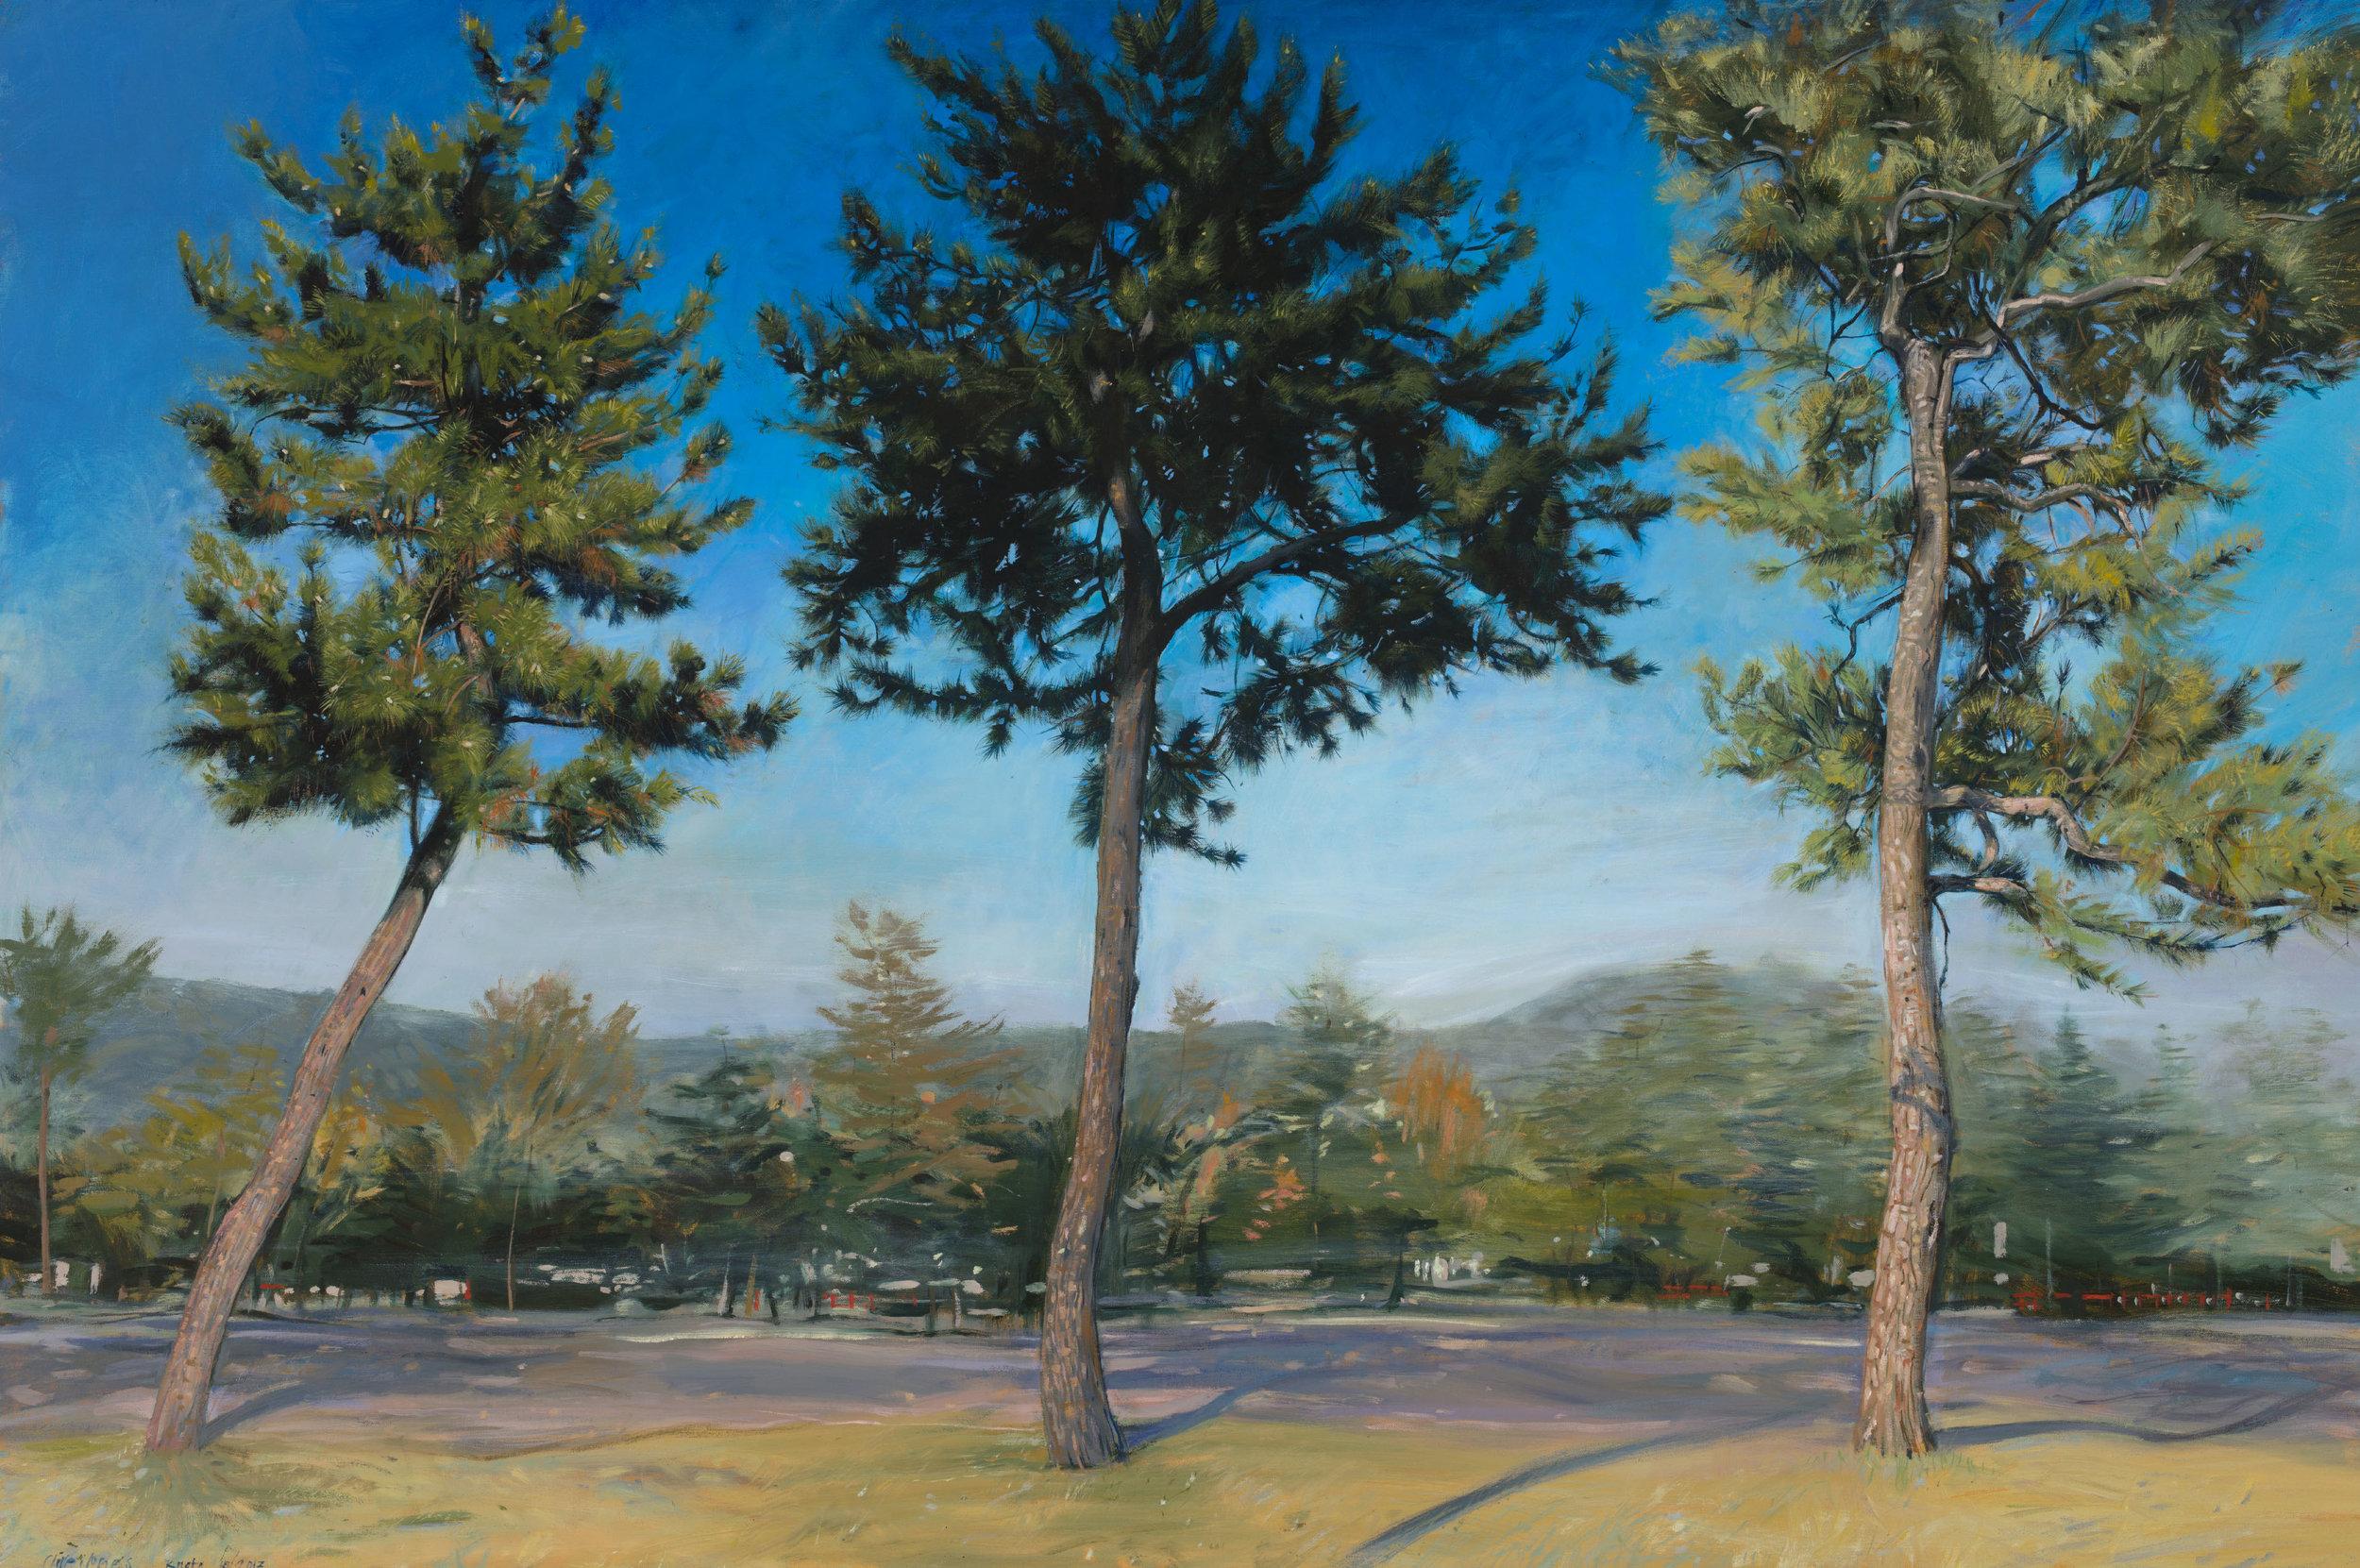 Clive Jones-Three Trees Kyoto-1375x915cms.jpg